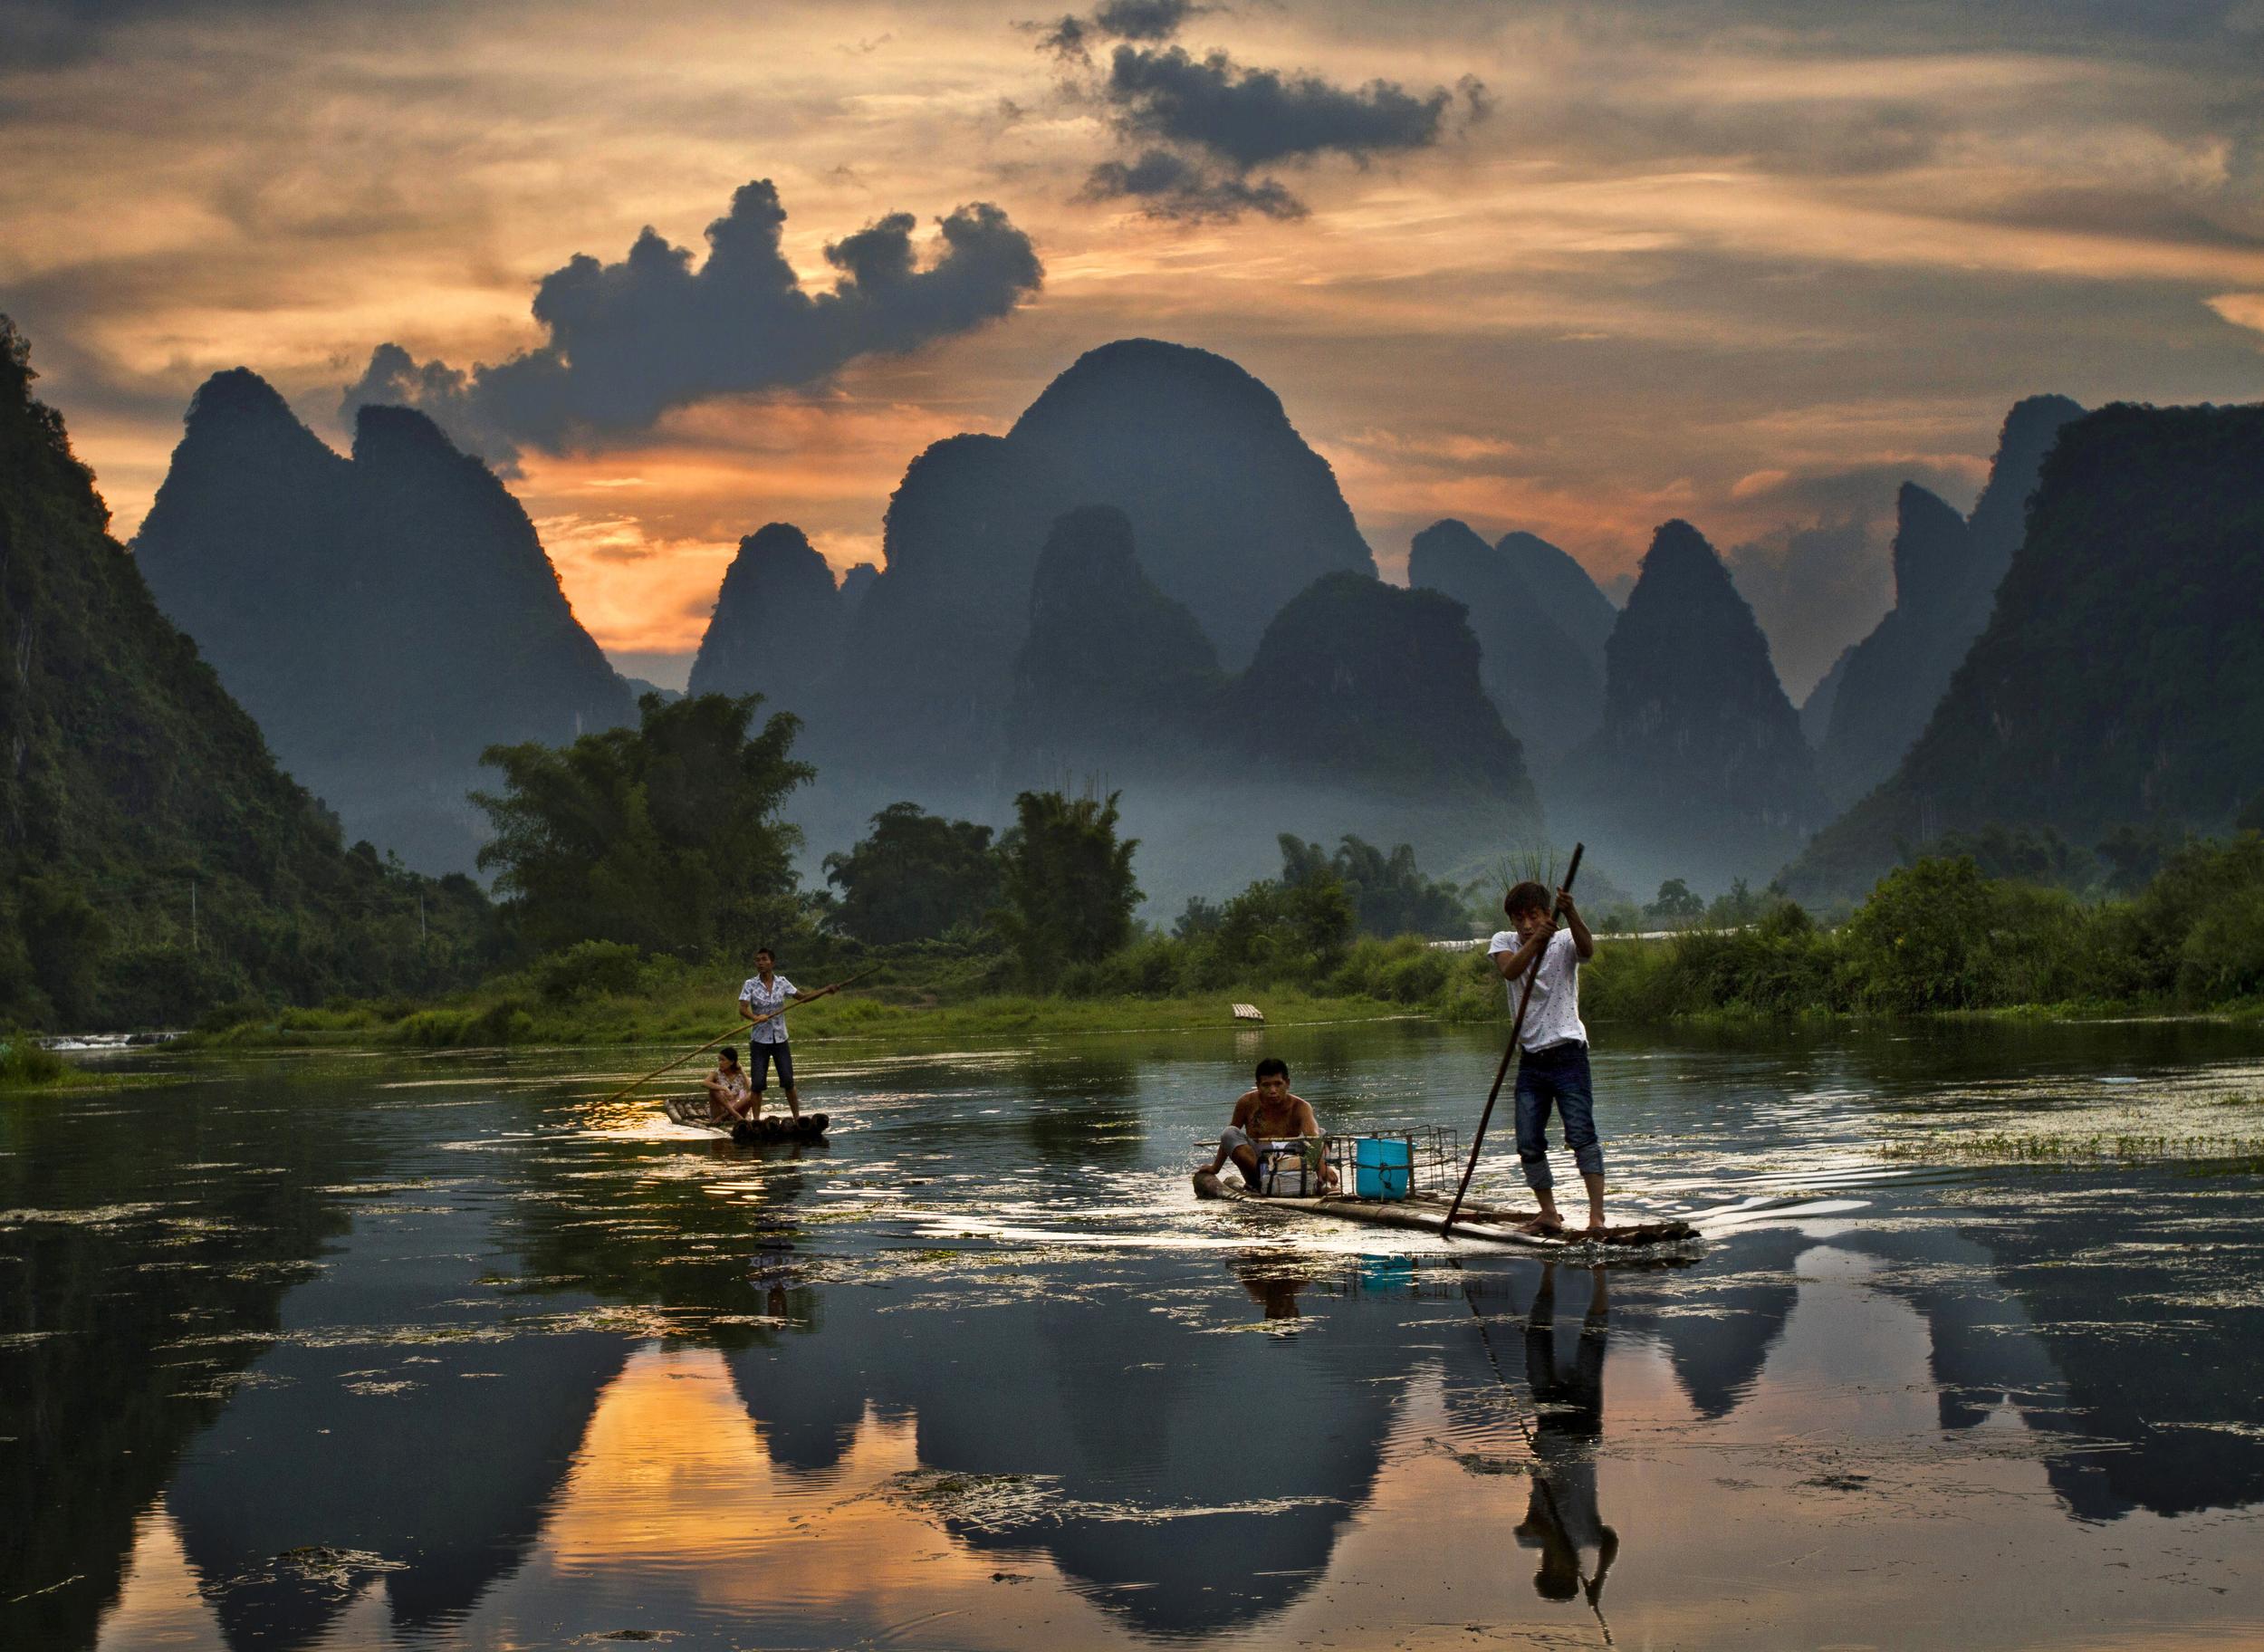 yangshuo raft.jpg